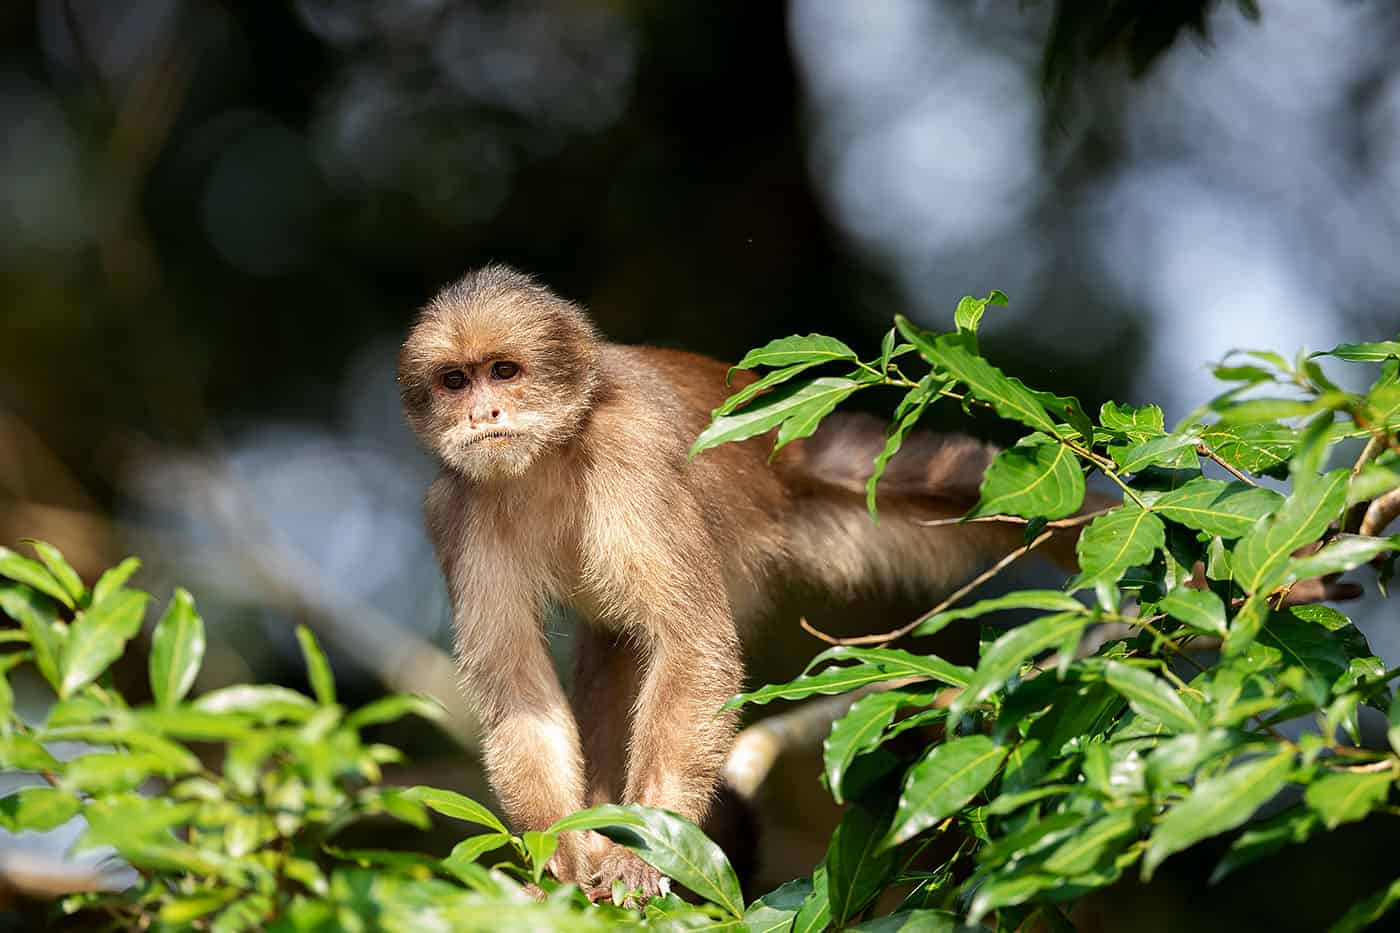 White Faced Capuchin Monkey, White Fonted Capuchin Monkey, Cebus Albifrons